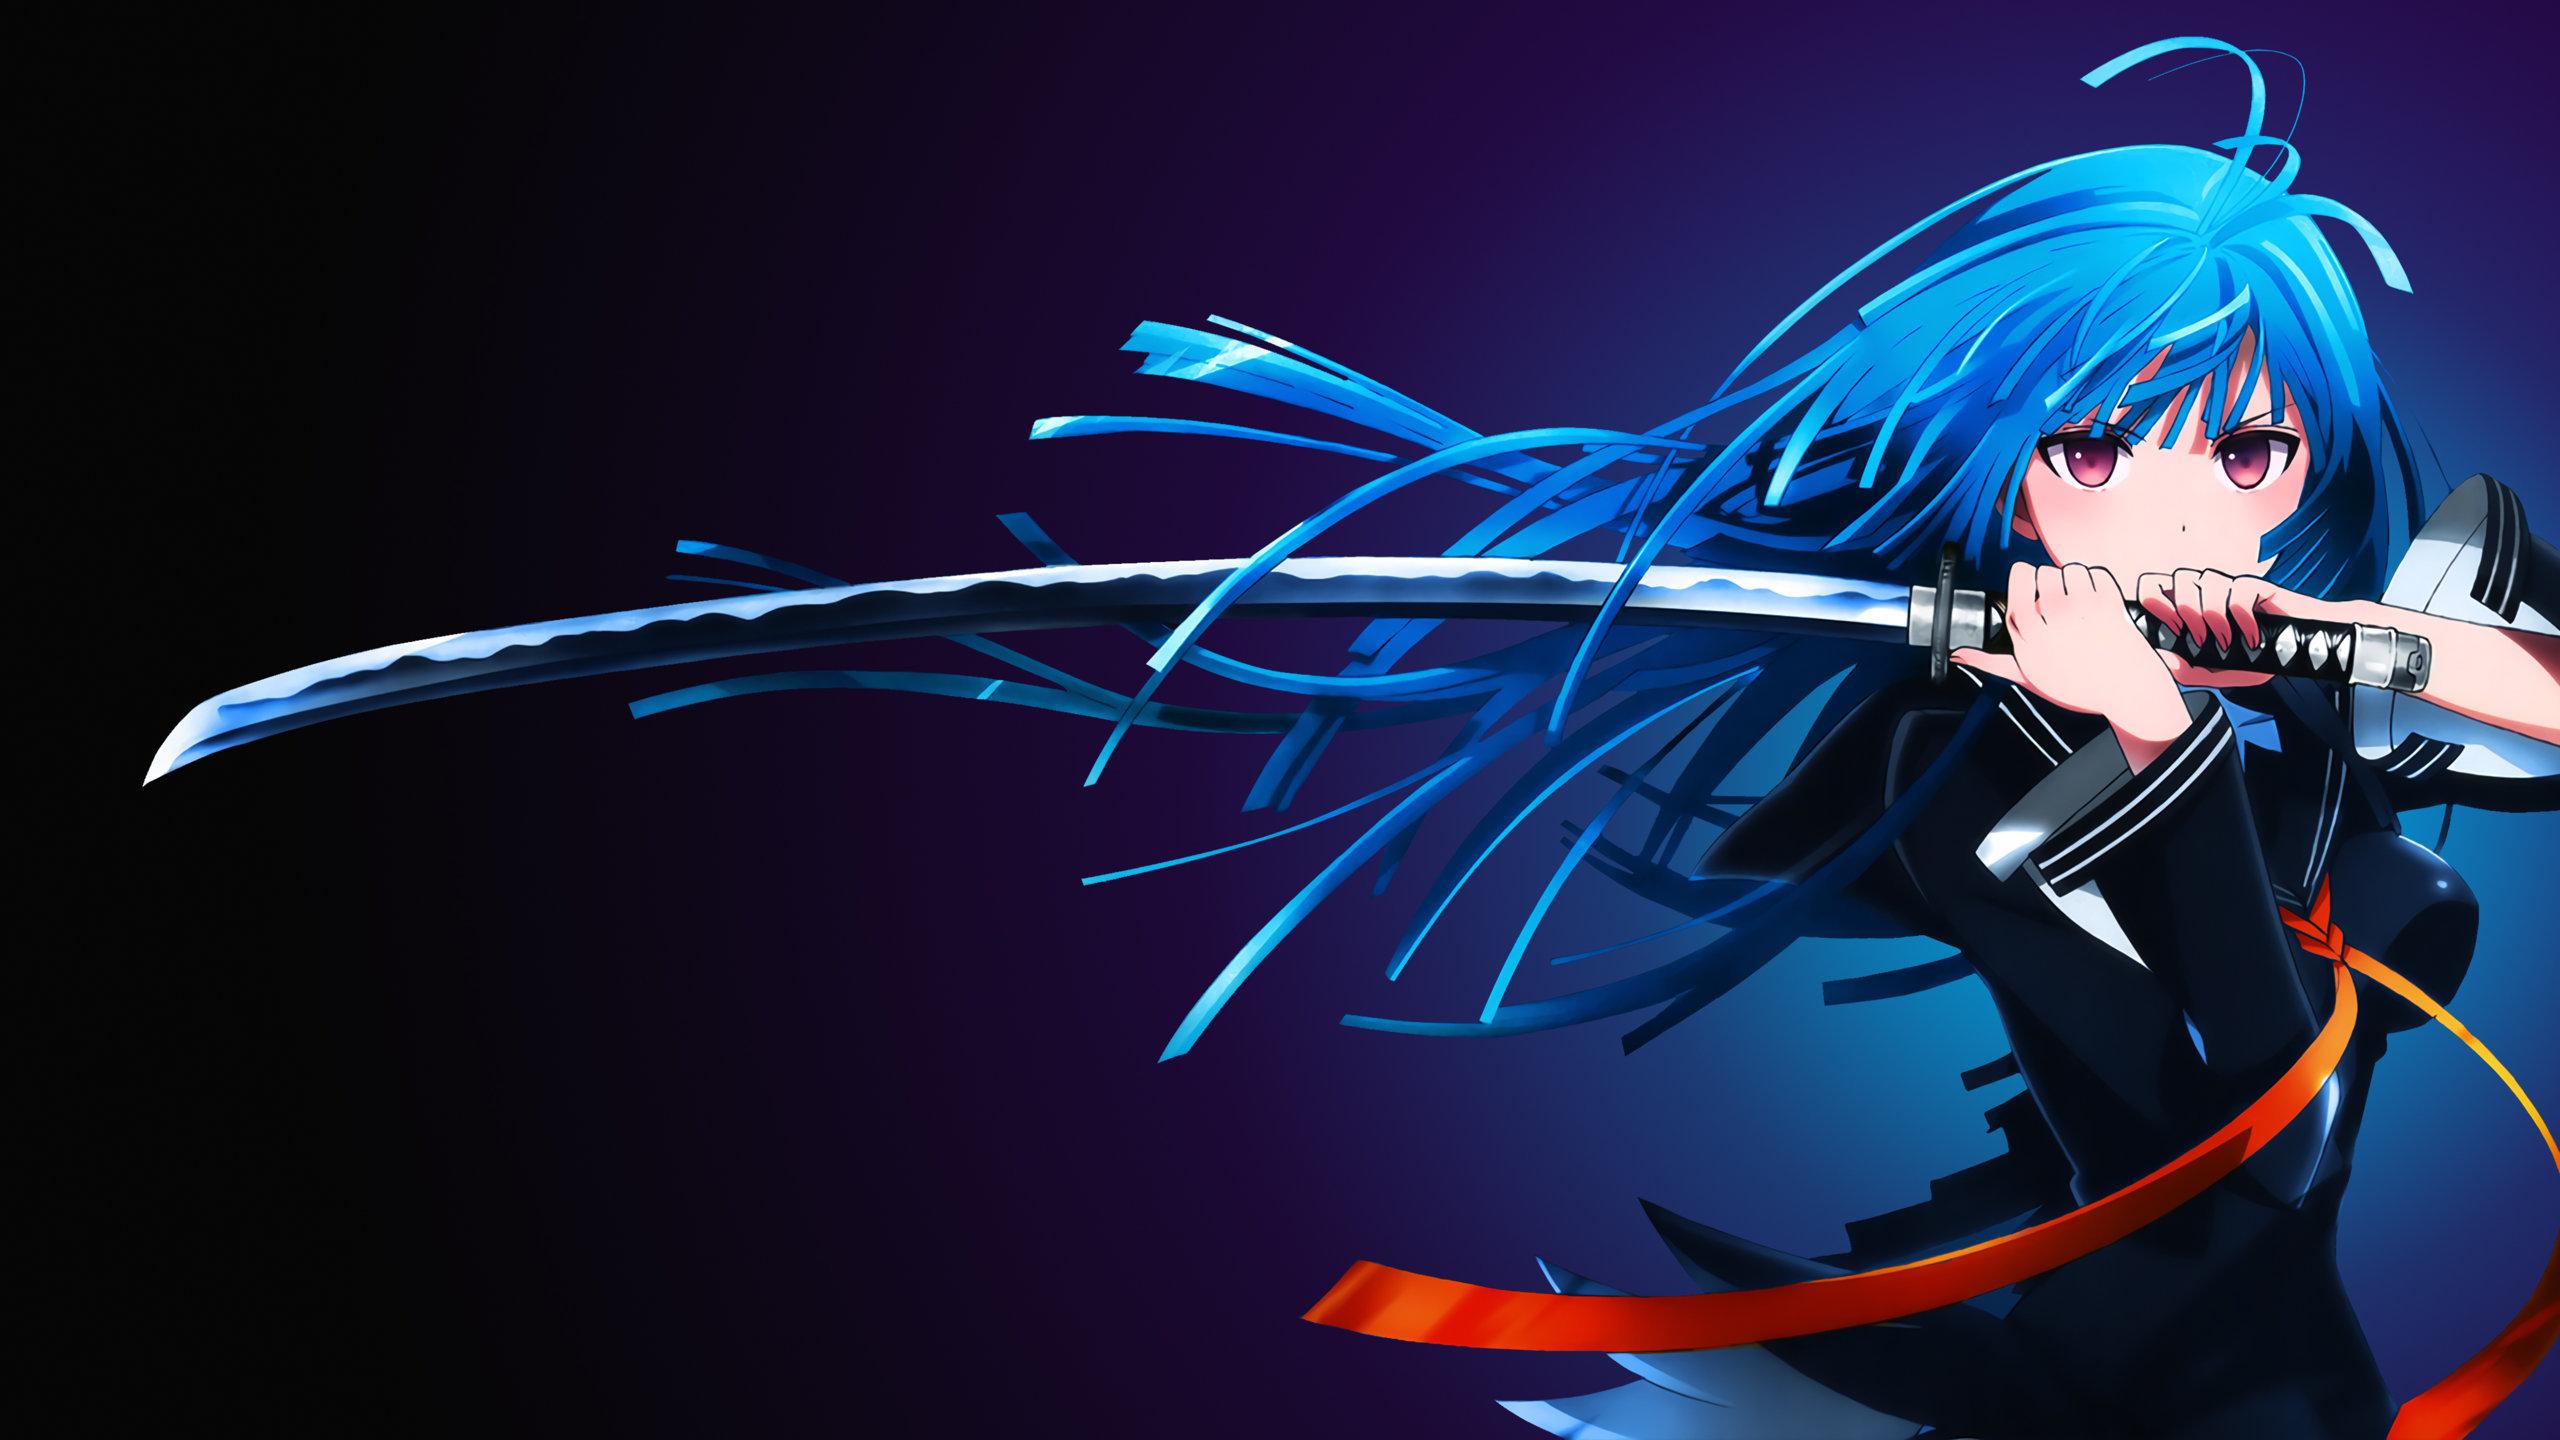 My 5k 4k resolution anime wallpaper collection anime